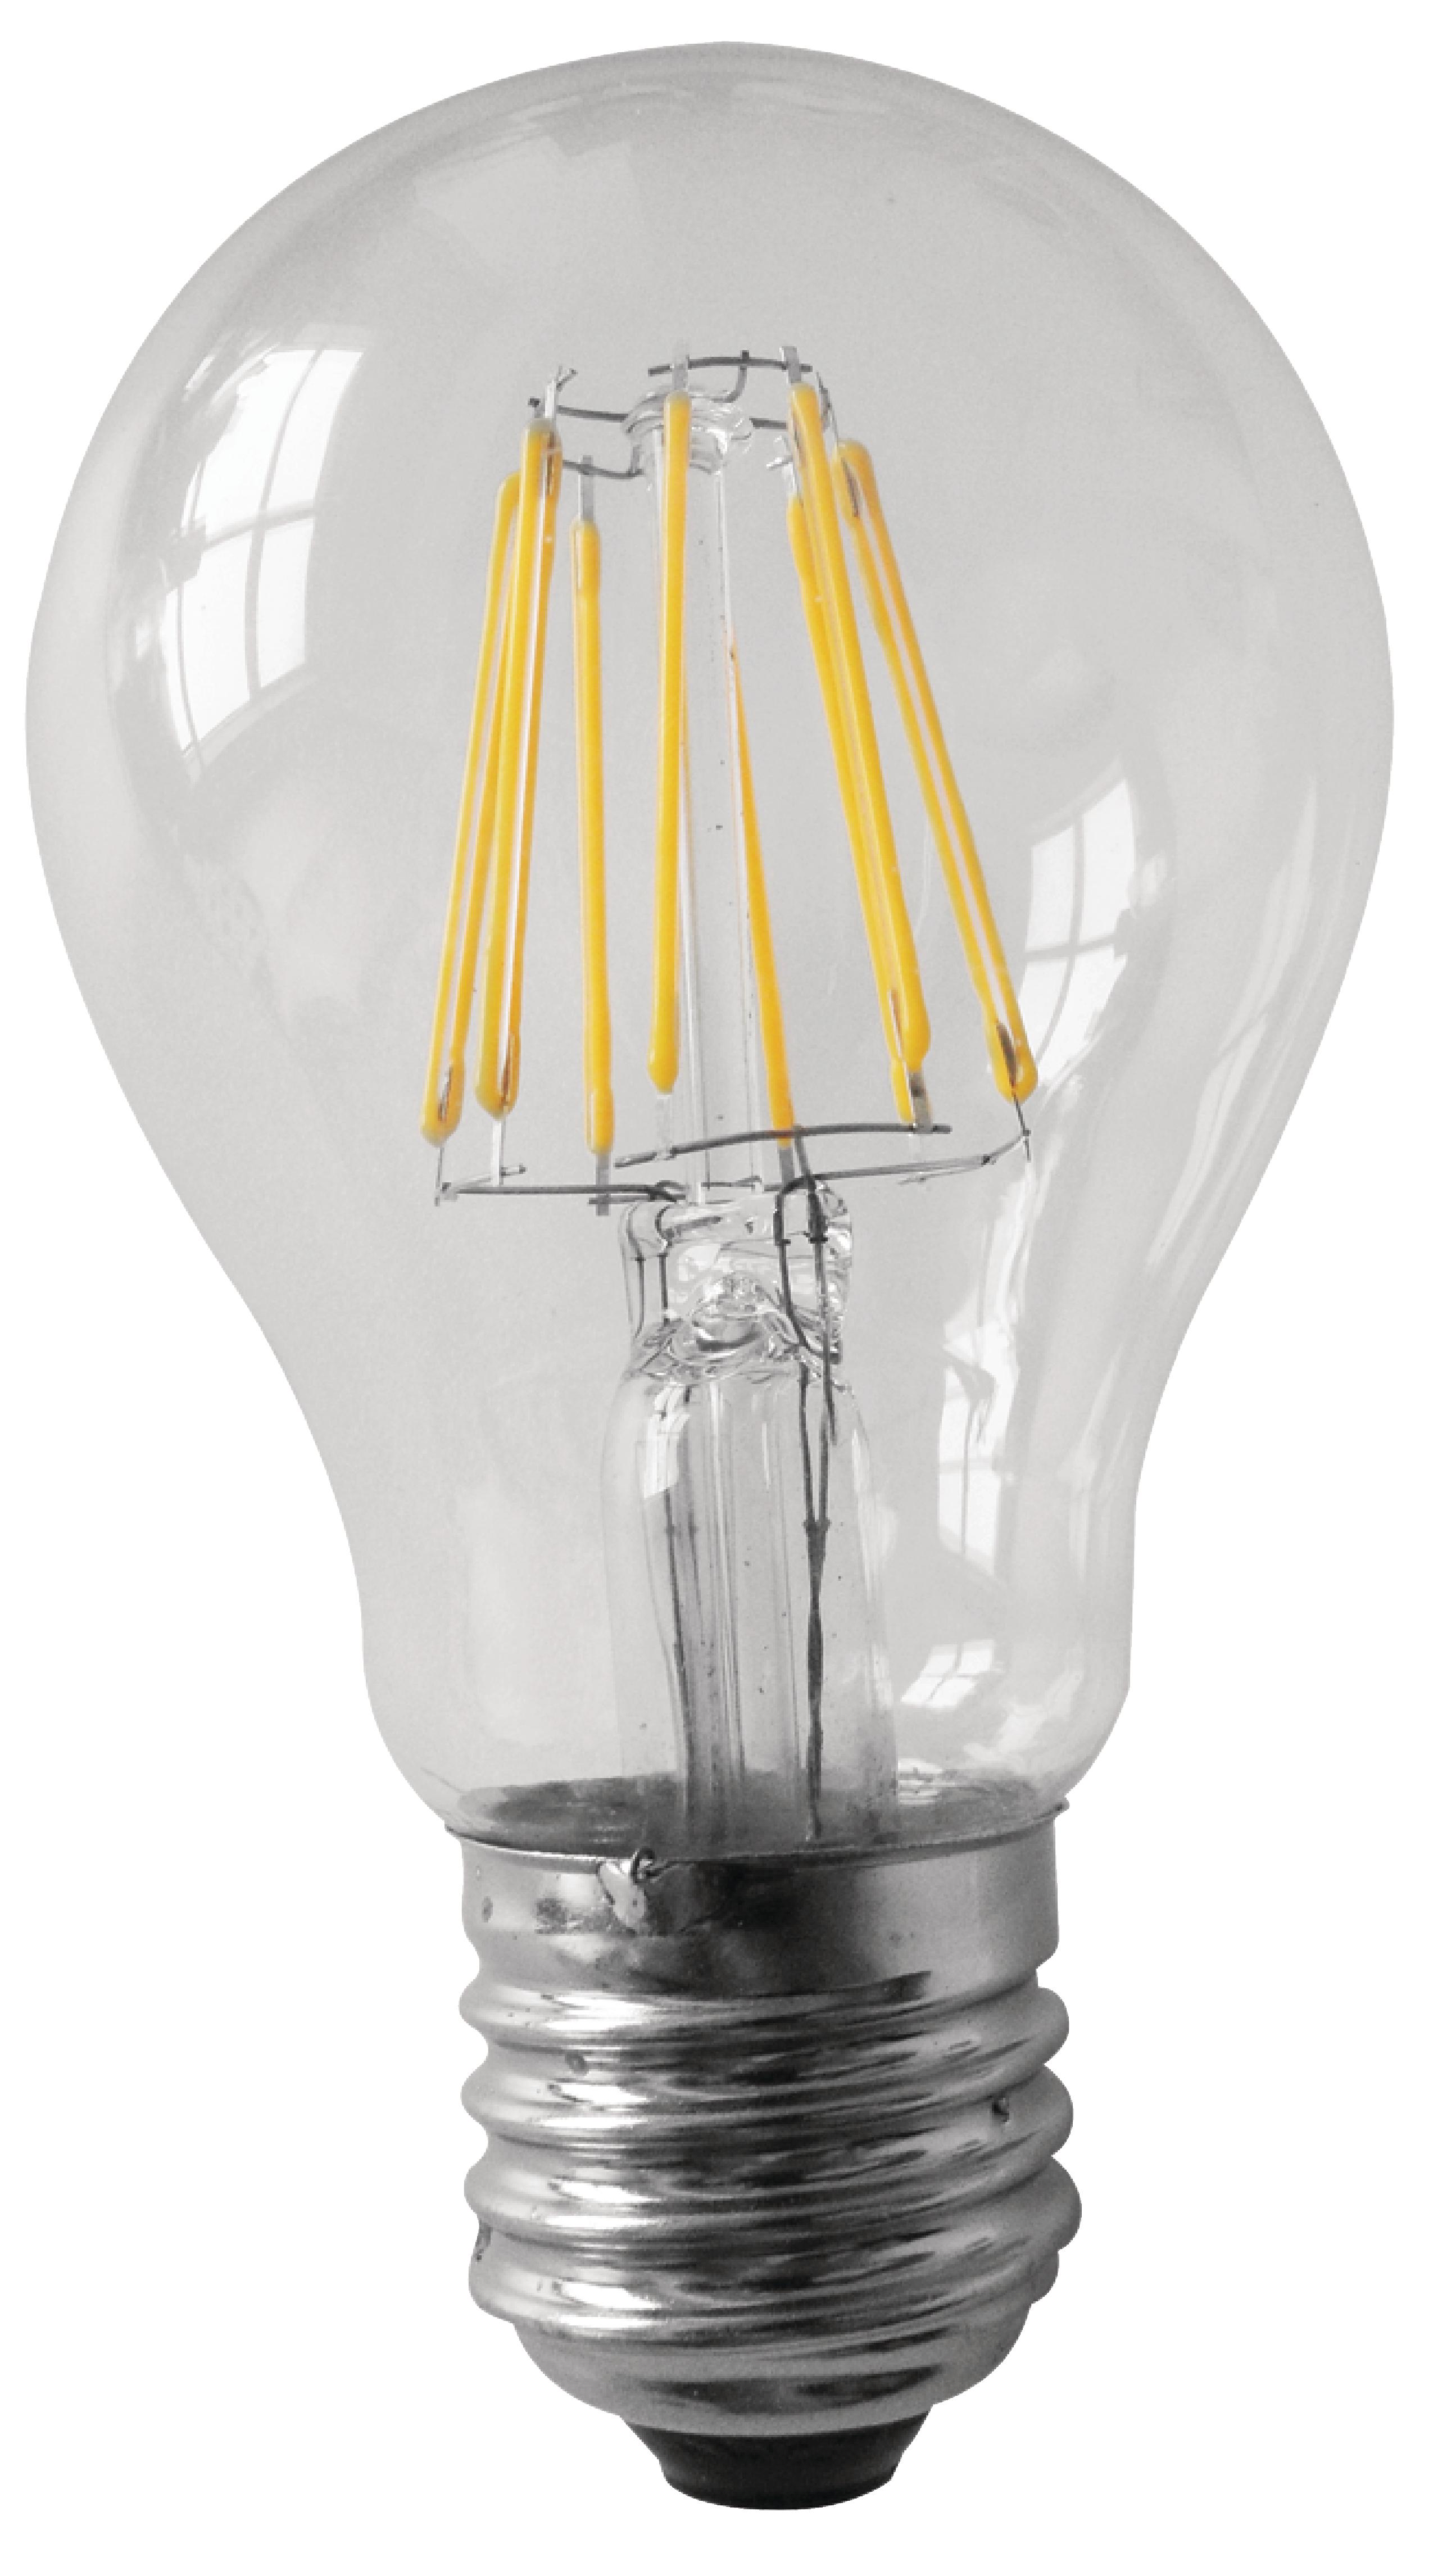 sha 00600429 led 39 s light led retro filament lamp e27 a60 7 5 w 720 lm 2700 k electronic. Black Bedroom Furniture Sets. Home Design Ideas